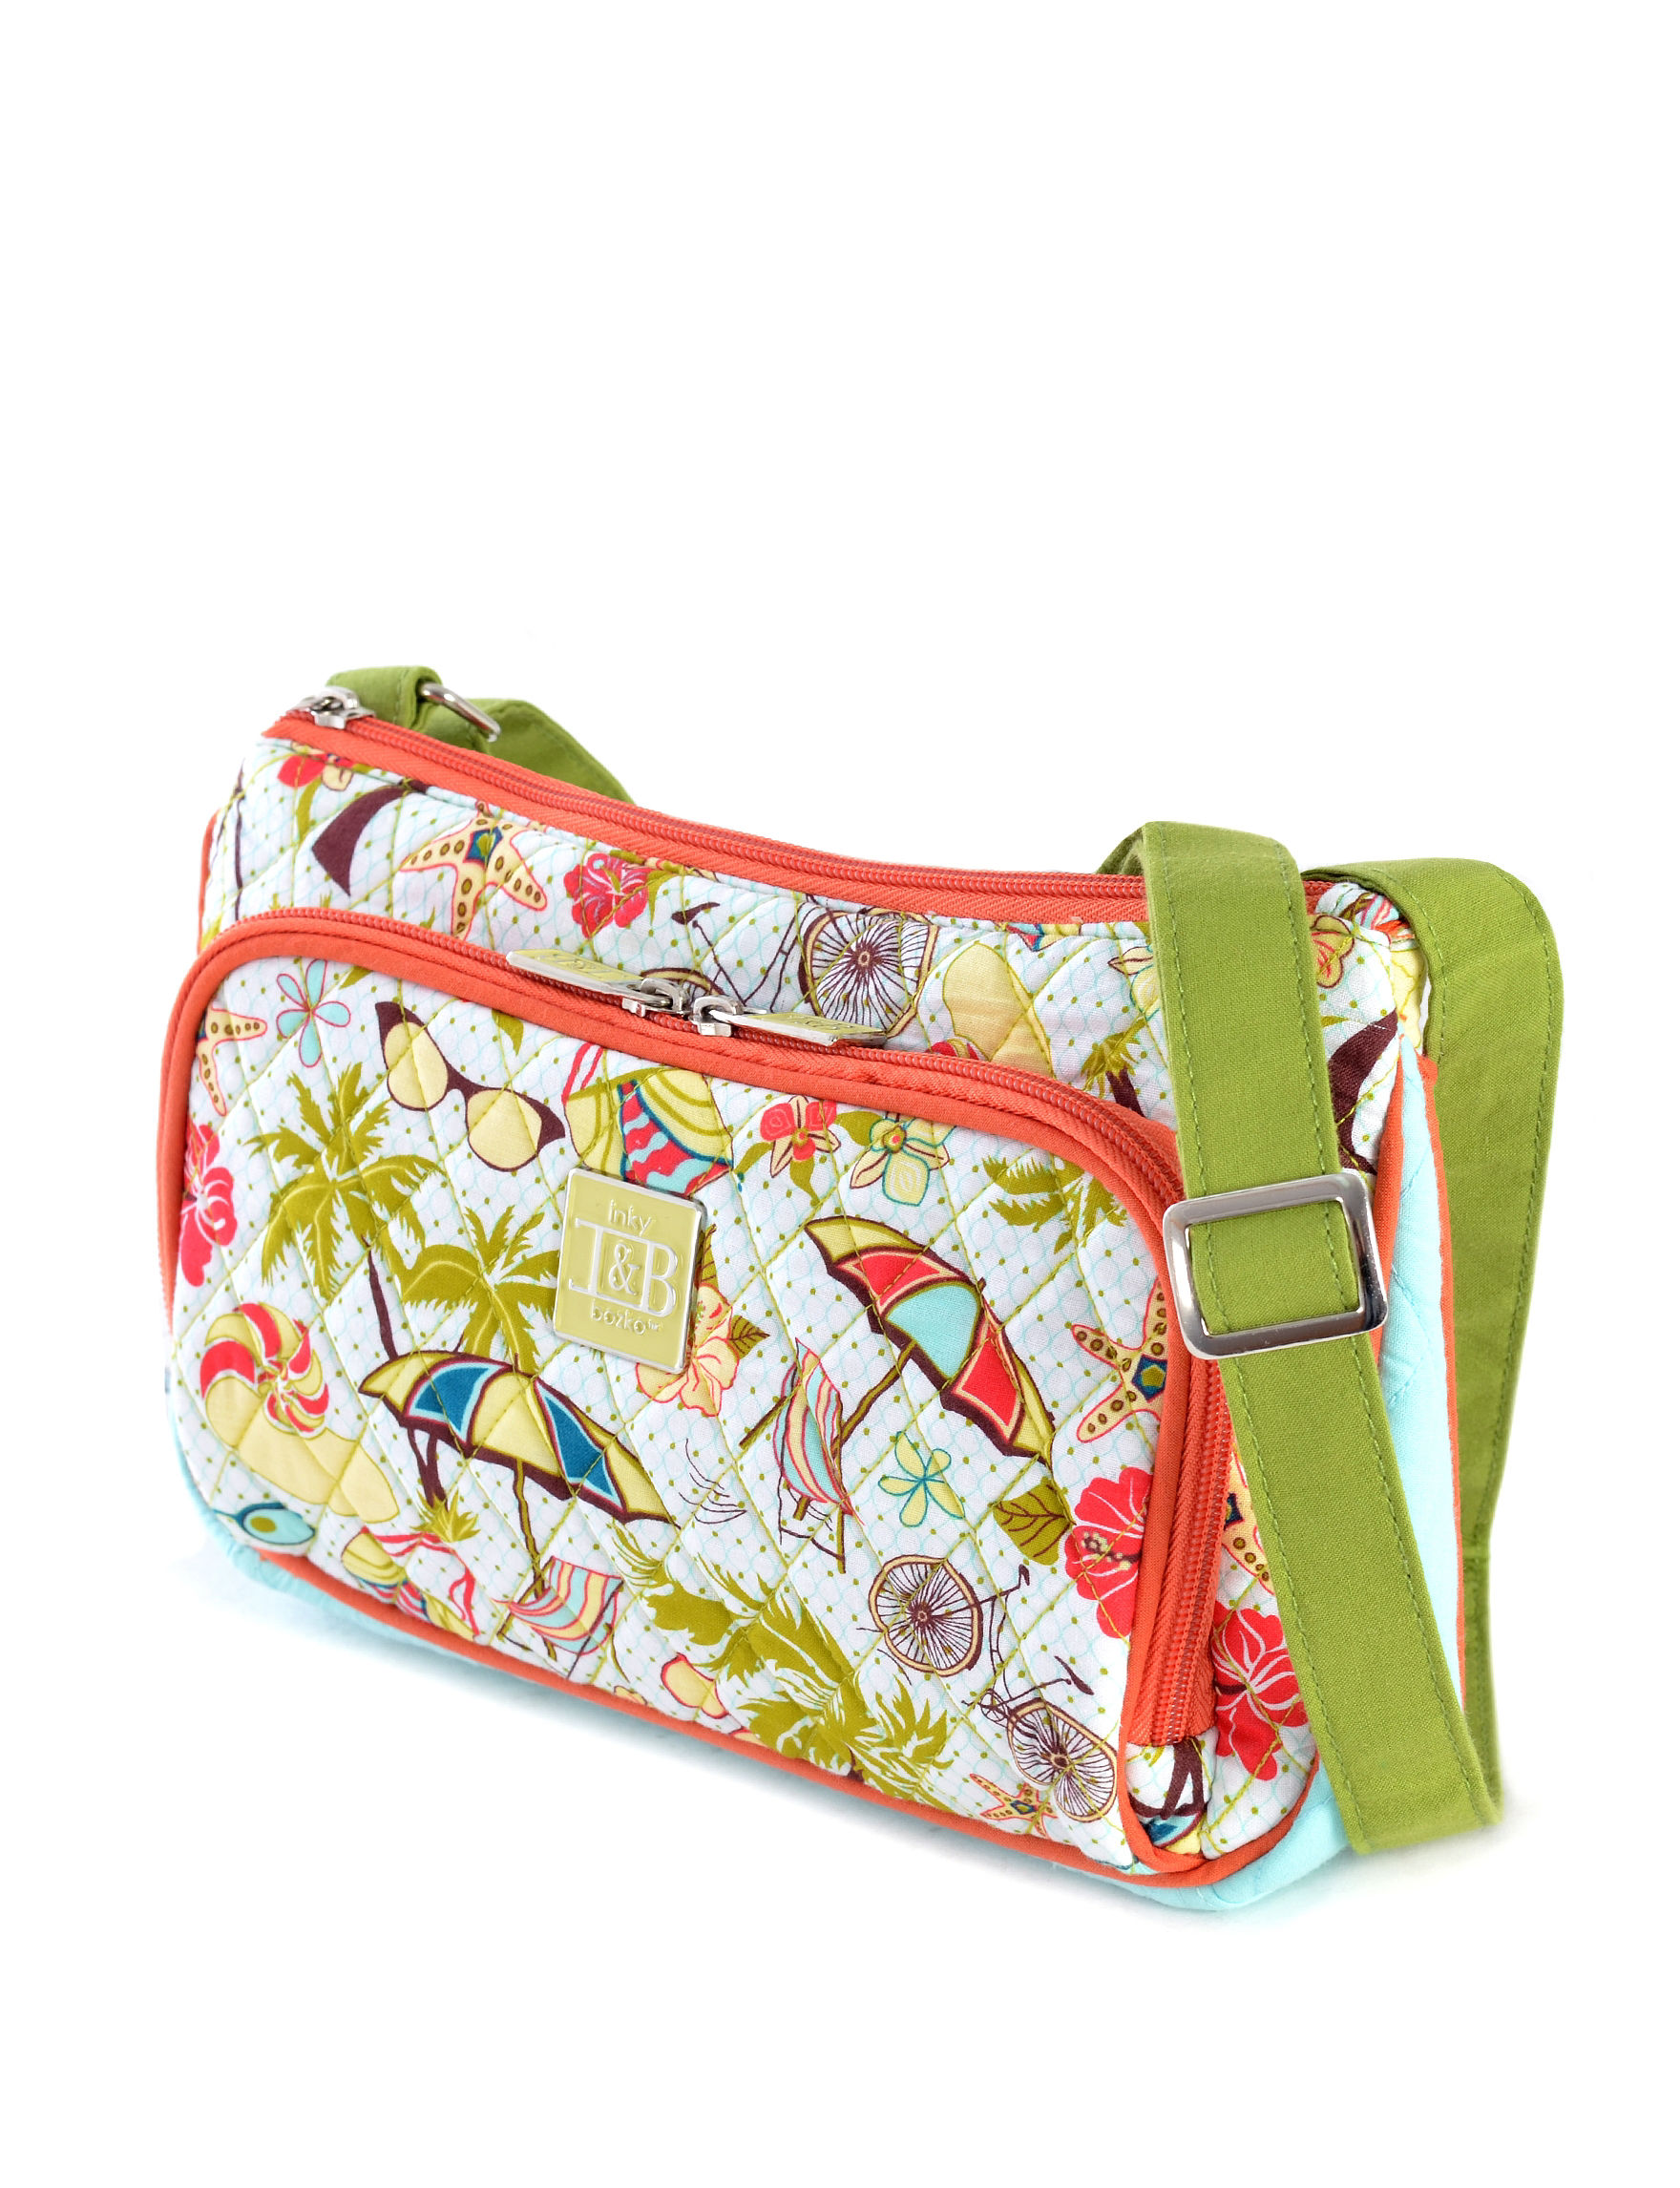 Inky & Bozko Orange Lunch Boxes & Bags Laptop & Messenger Bags